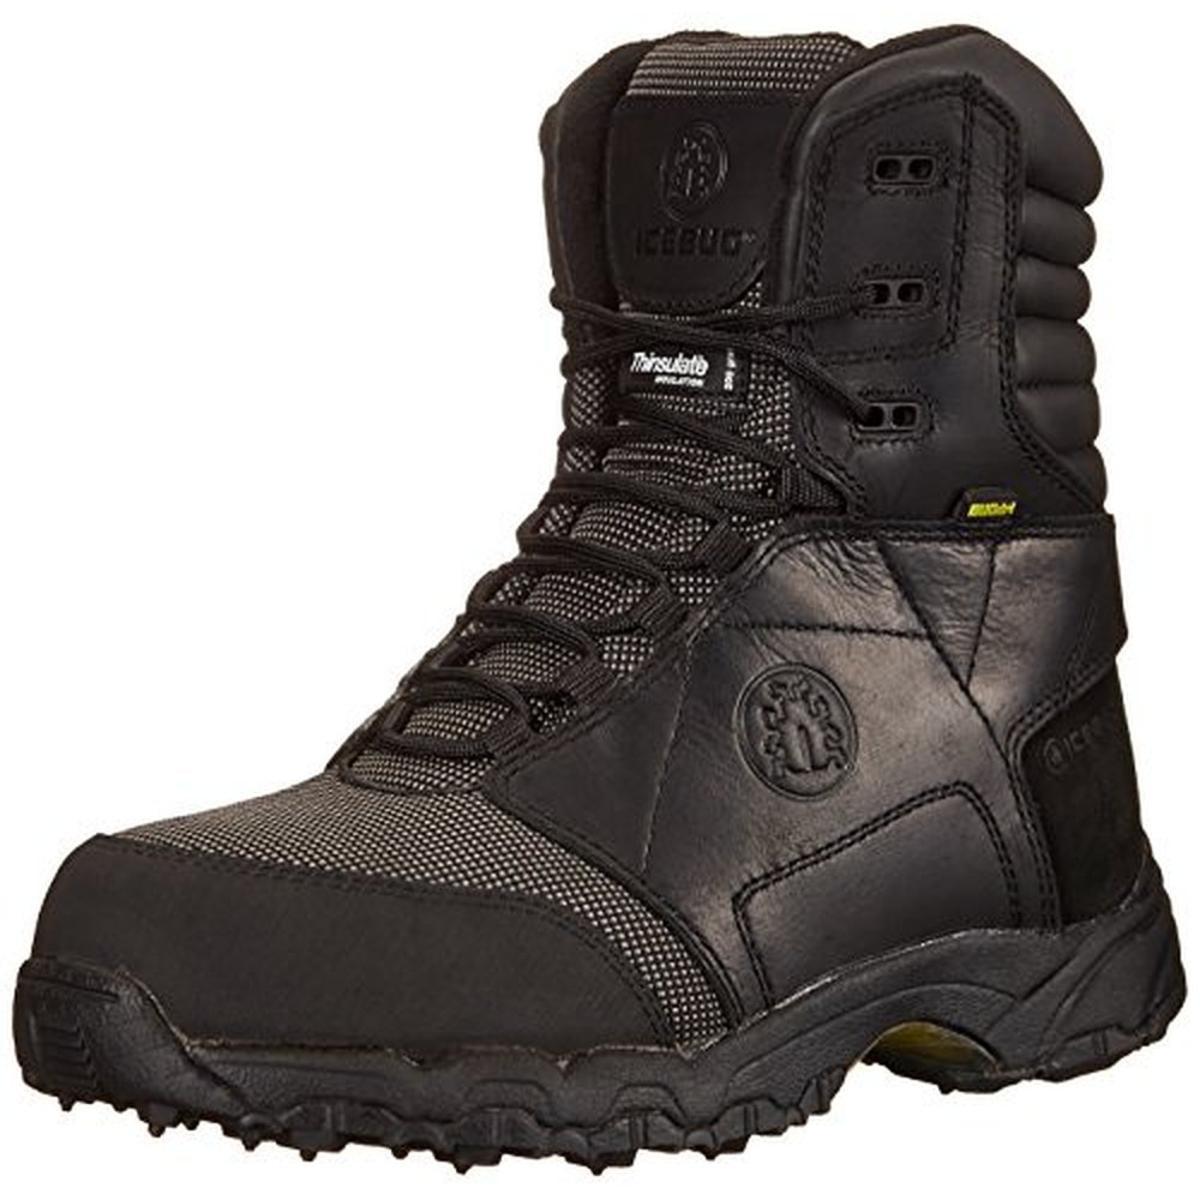 Icebug Mens Vidar Pro High Leather Aluminum Toe Work Boots